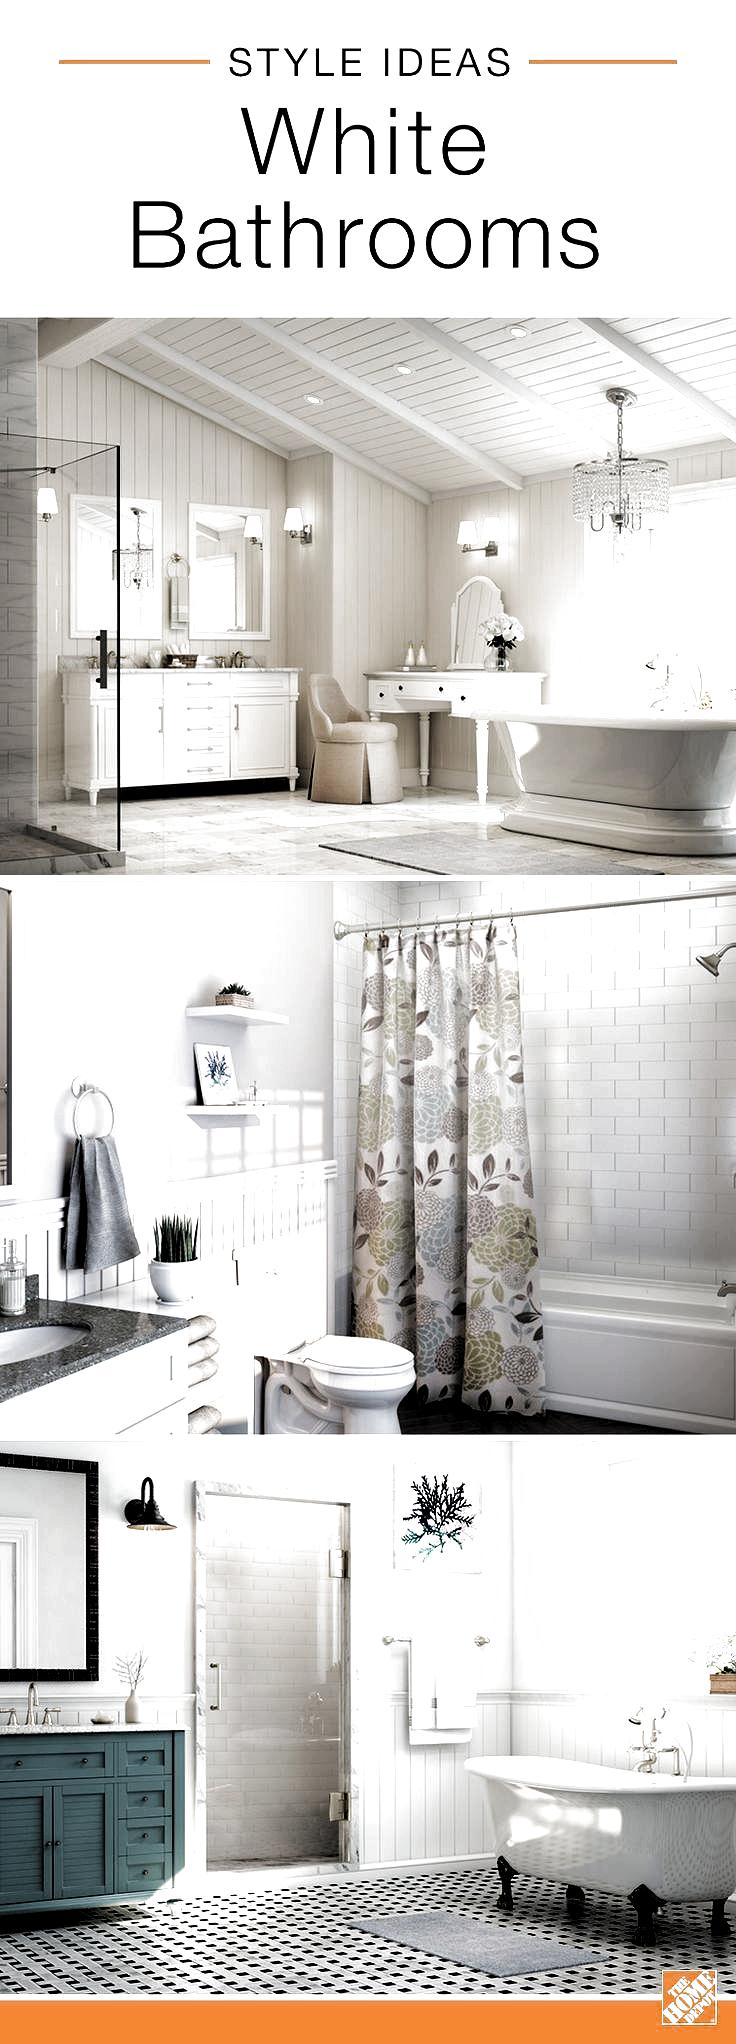 Photo of #ayouu2019re #bathroom design #bathroom design tool #bathroom ideas #bathroom id…